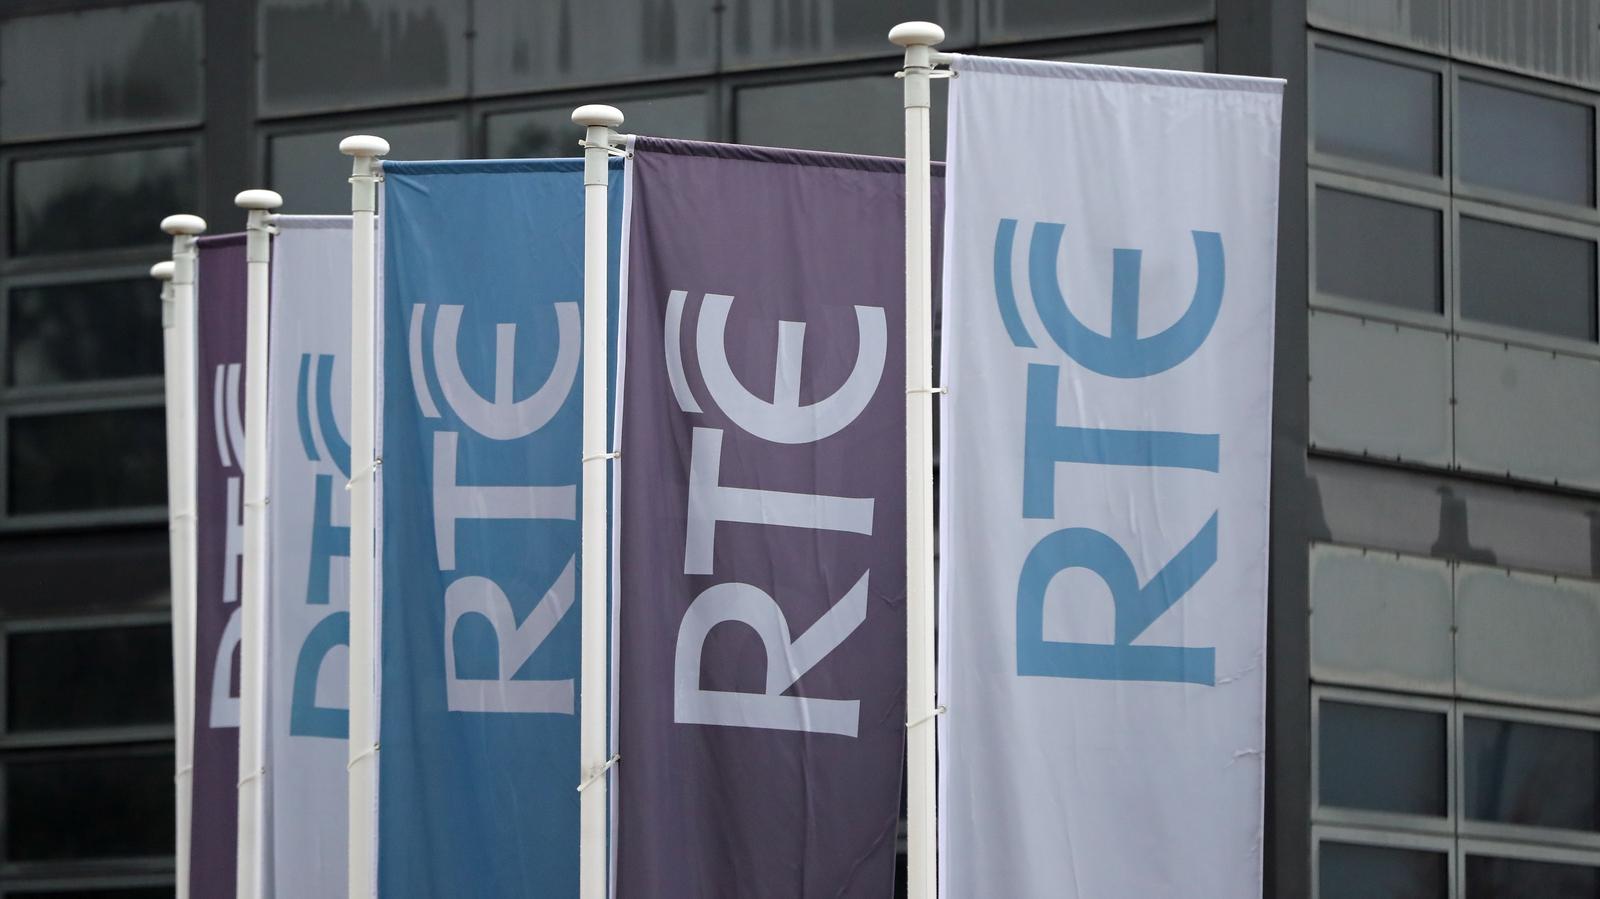 RTÉ staff reject proposals over salary, job cuts